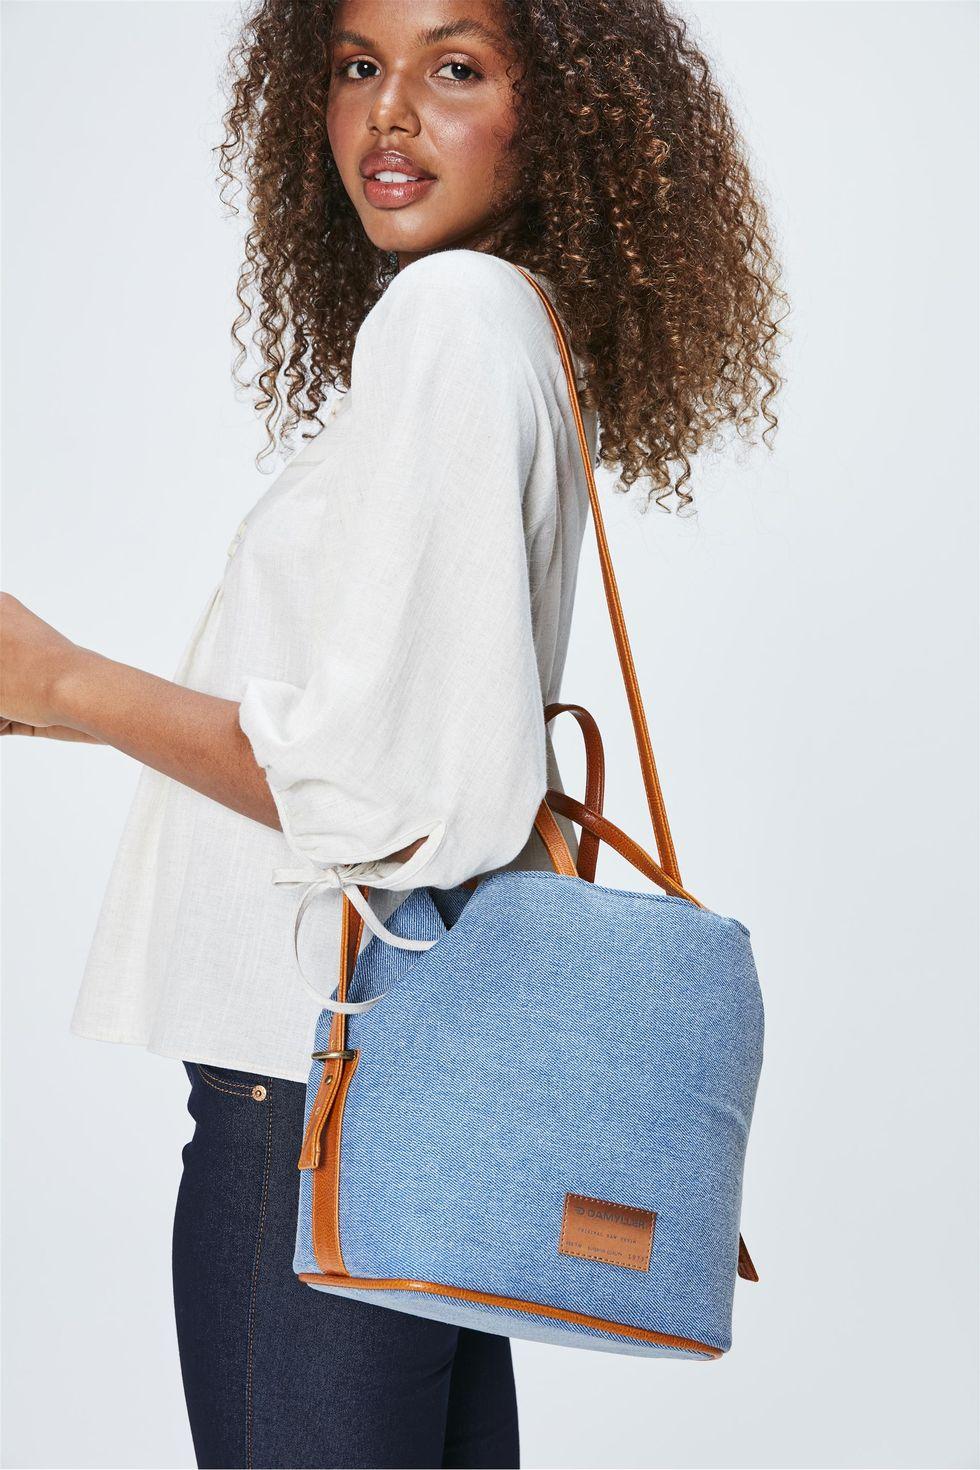 Bolsa-Jeans-Dupla-Feminina-Frente--